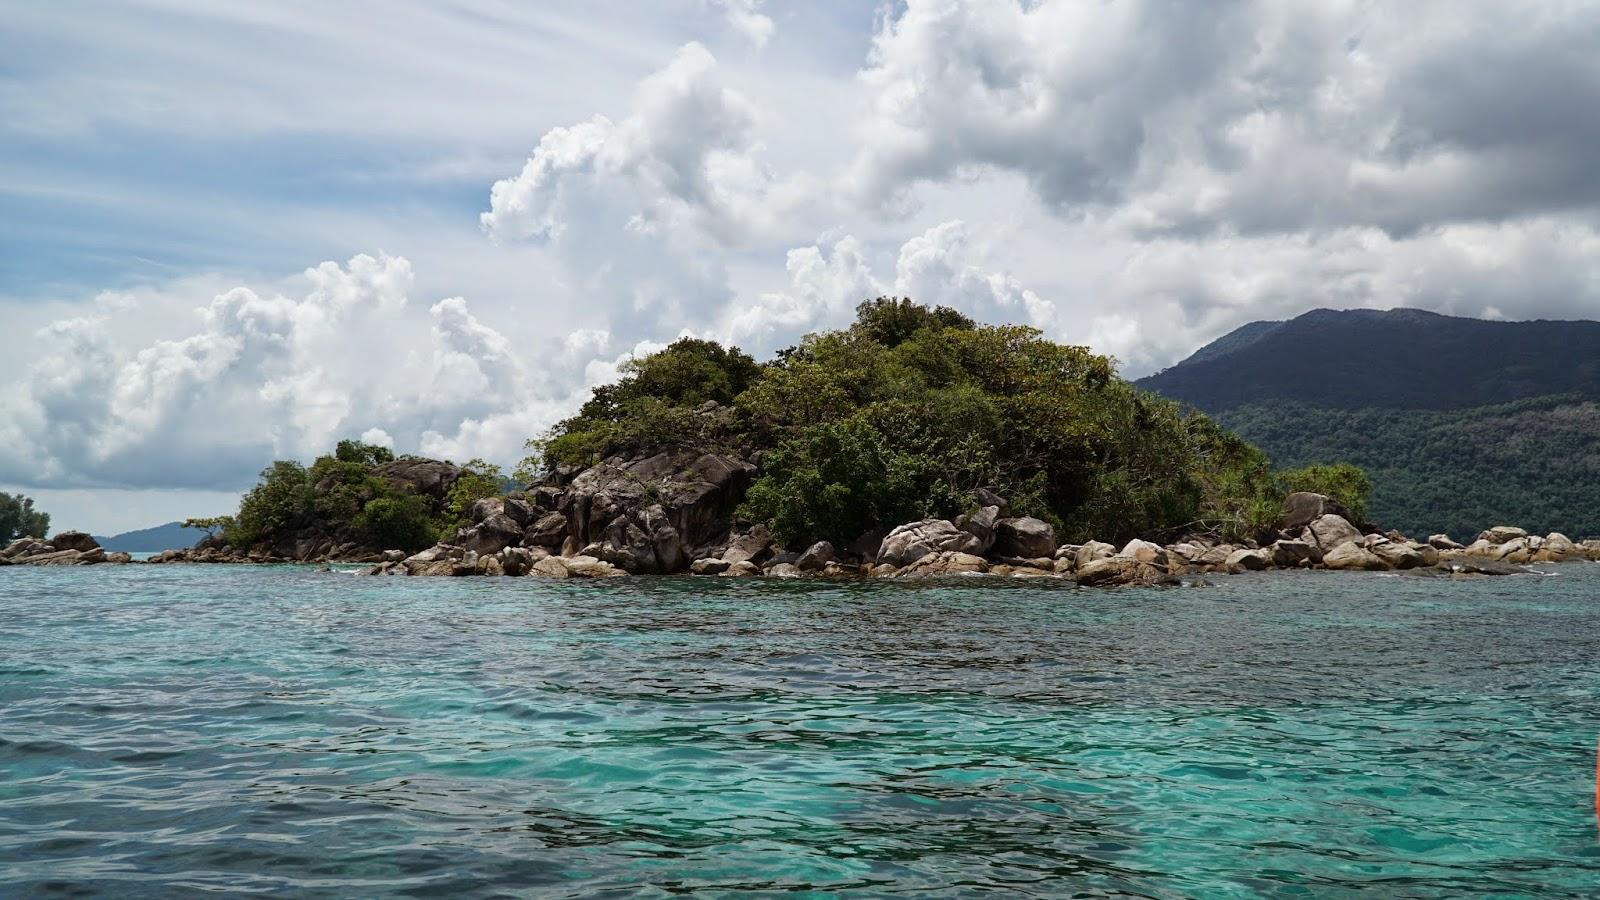 The snorkeling site off Koh Kra